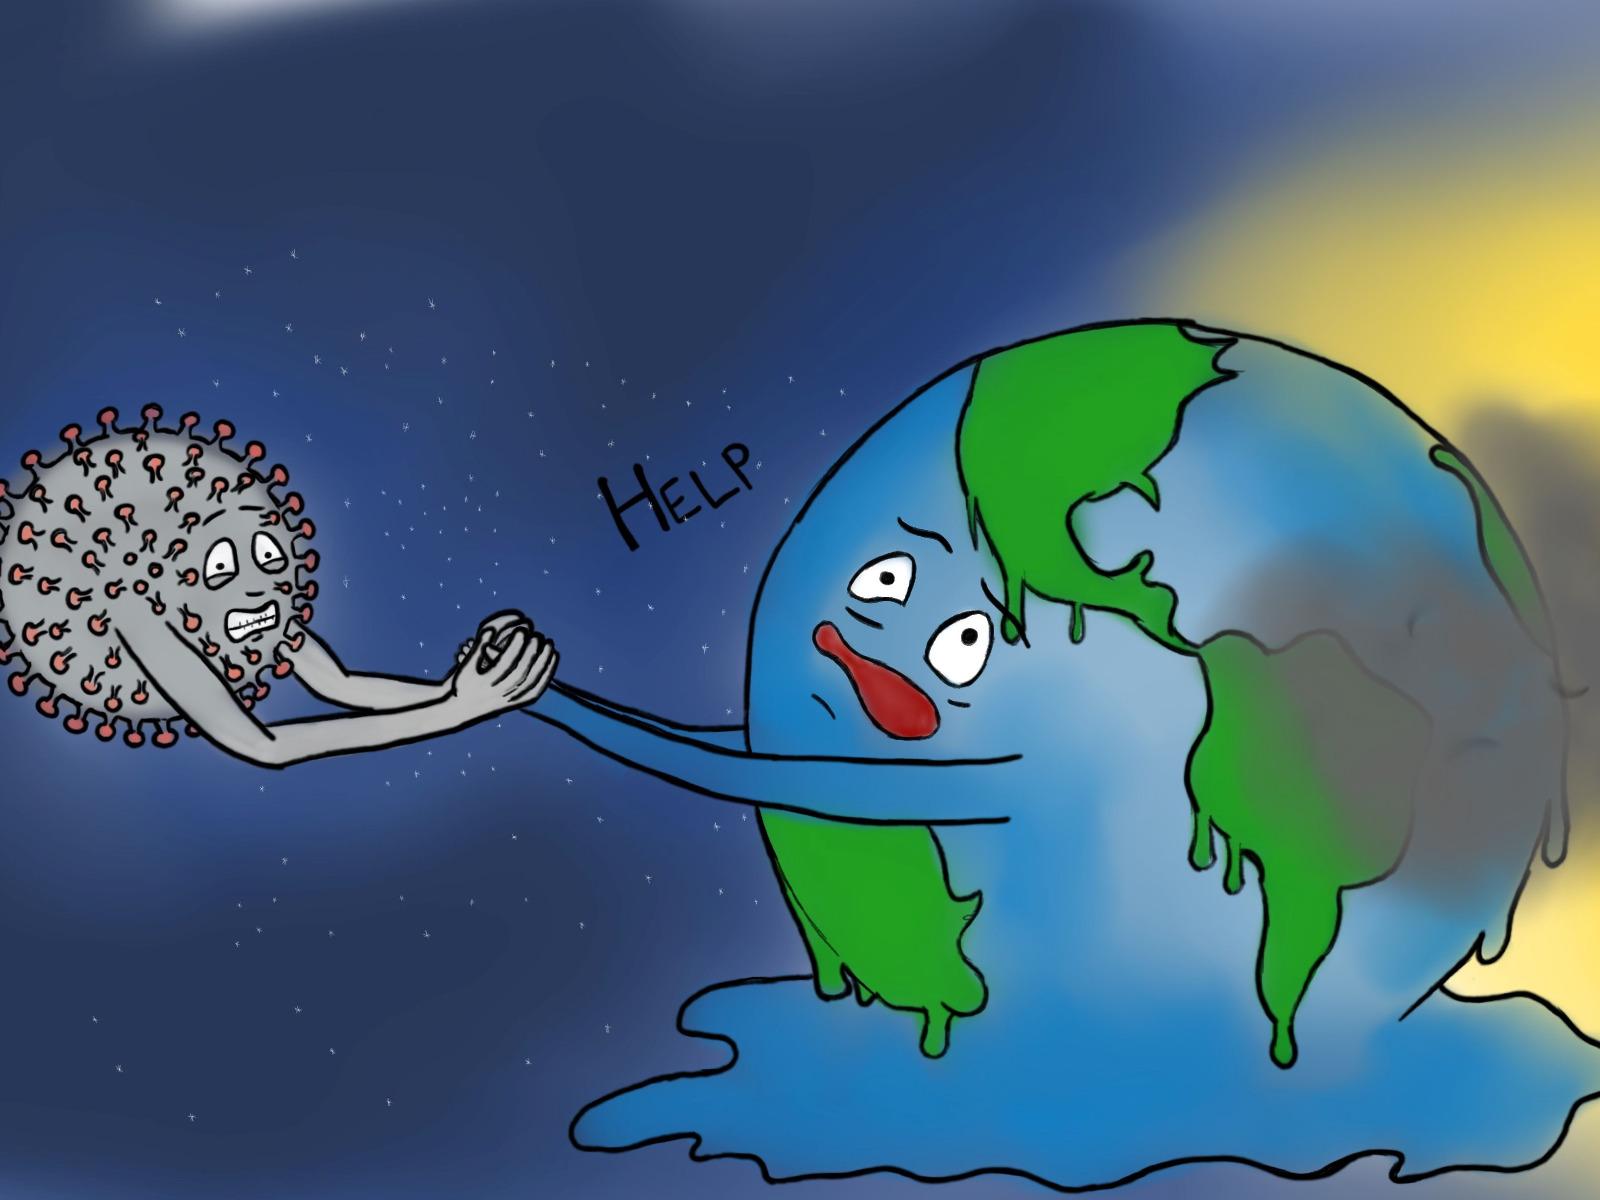 The Corona virus tries to help up the earth.